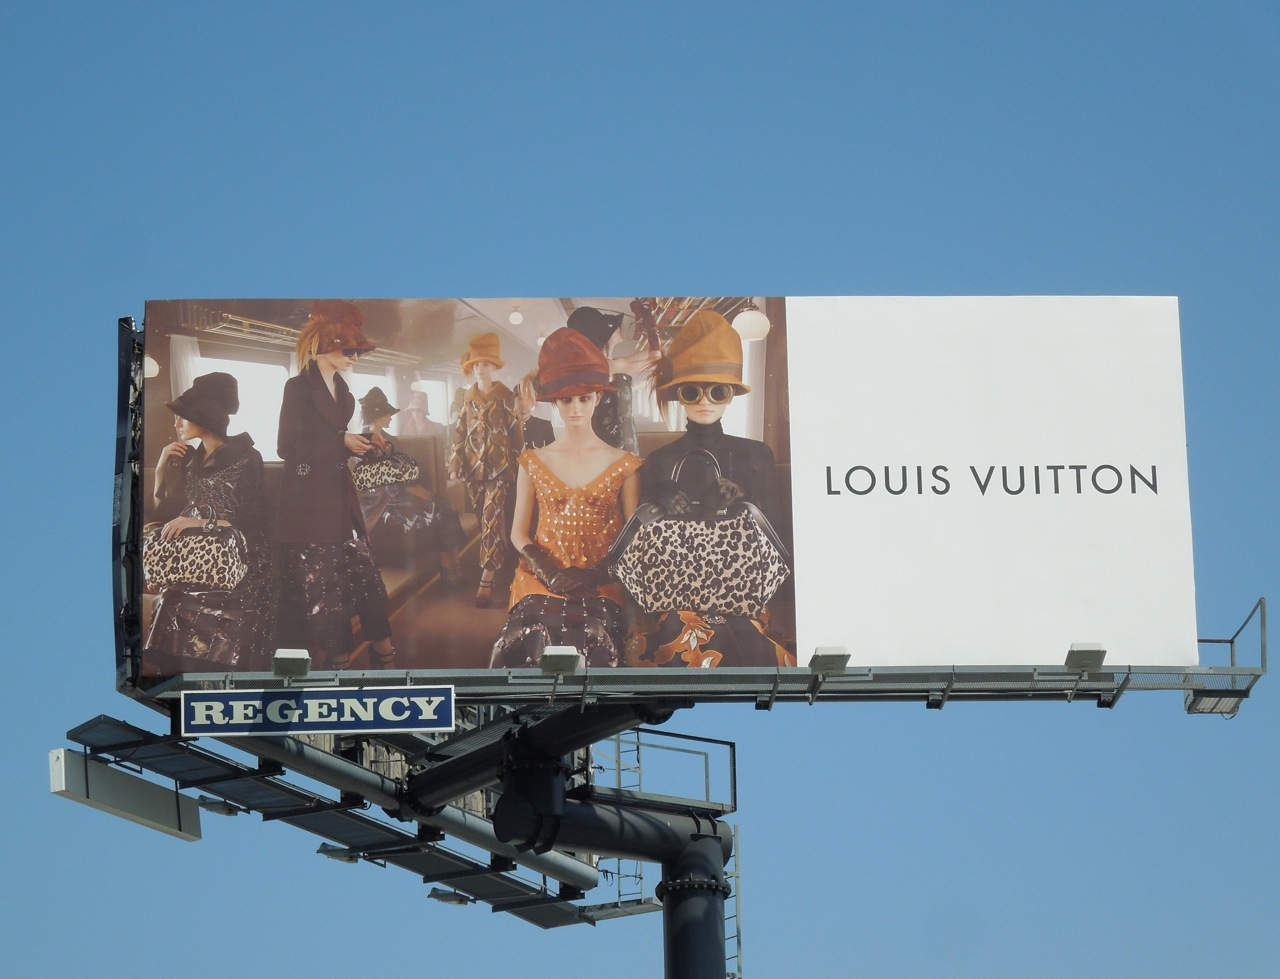 Louis Vuitton F/W 2012 train carriage billboard